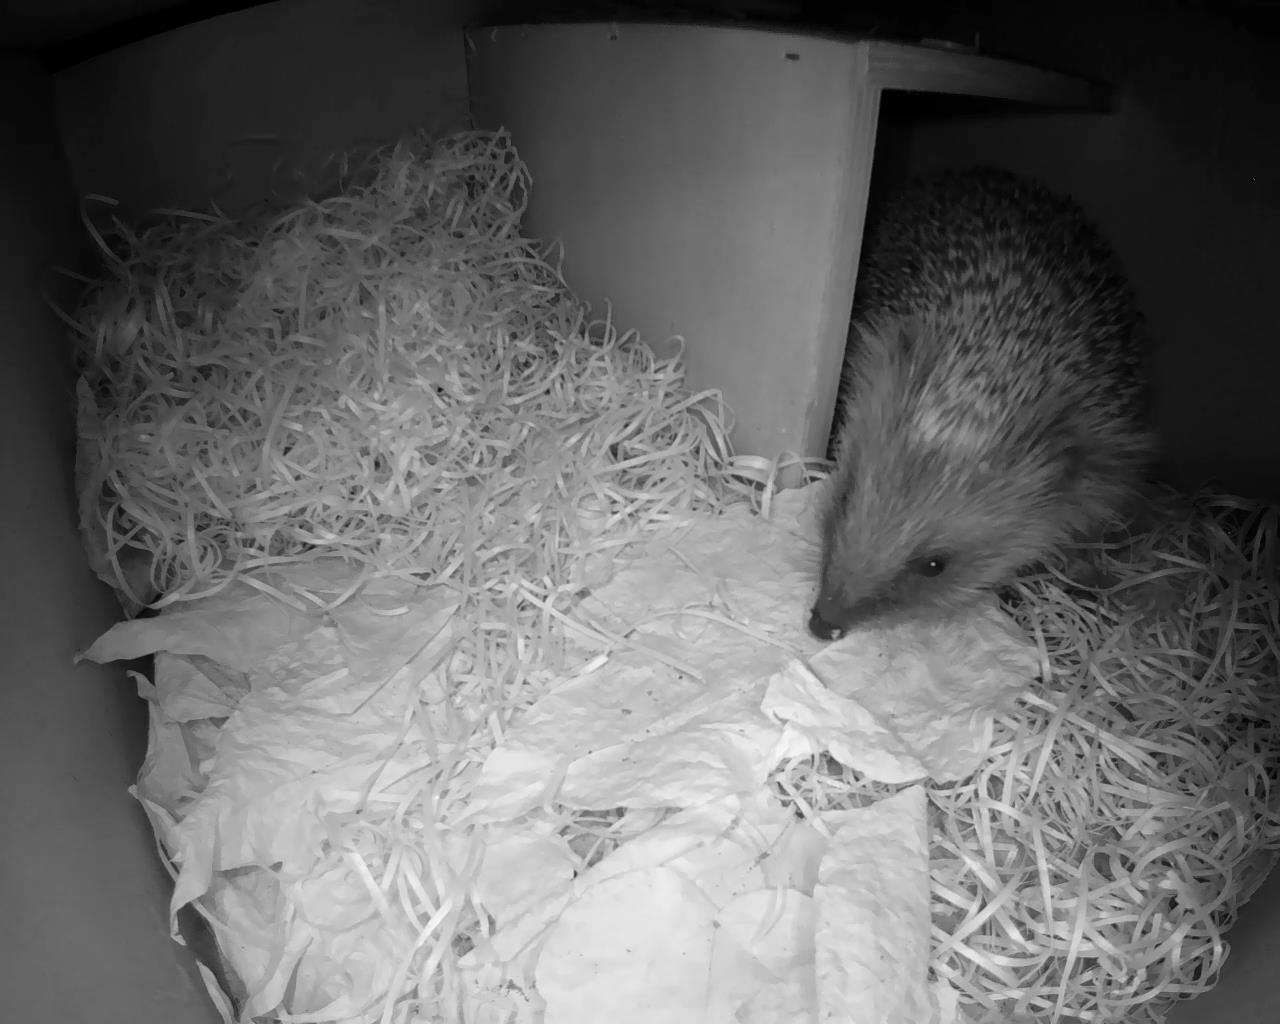 Hedgehog Box 2016-04-17 21-11-51.137